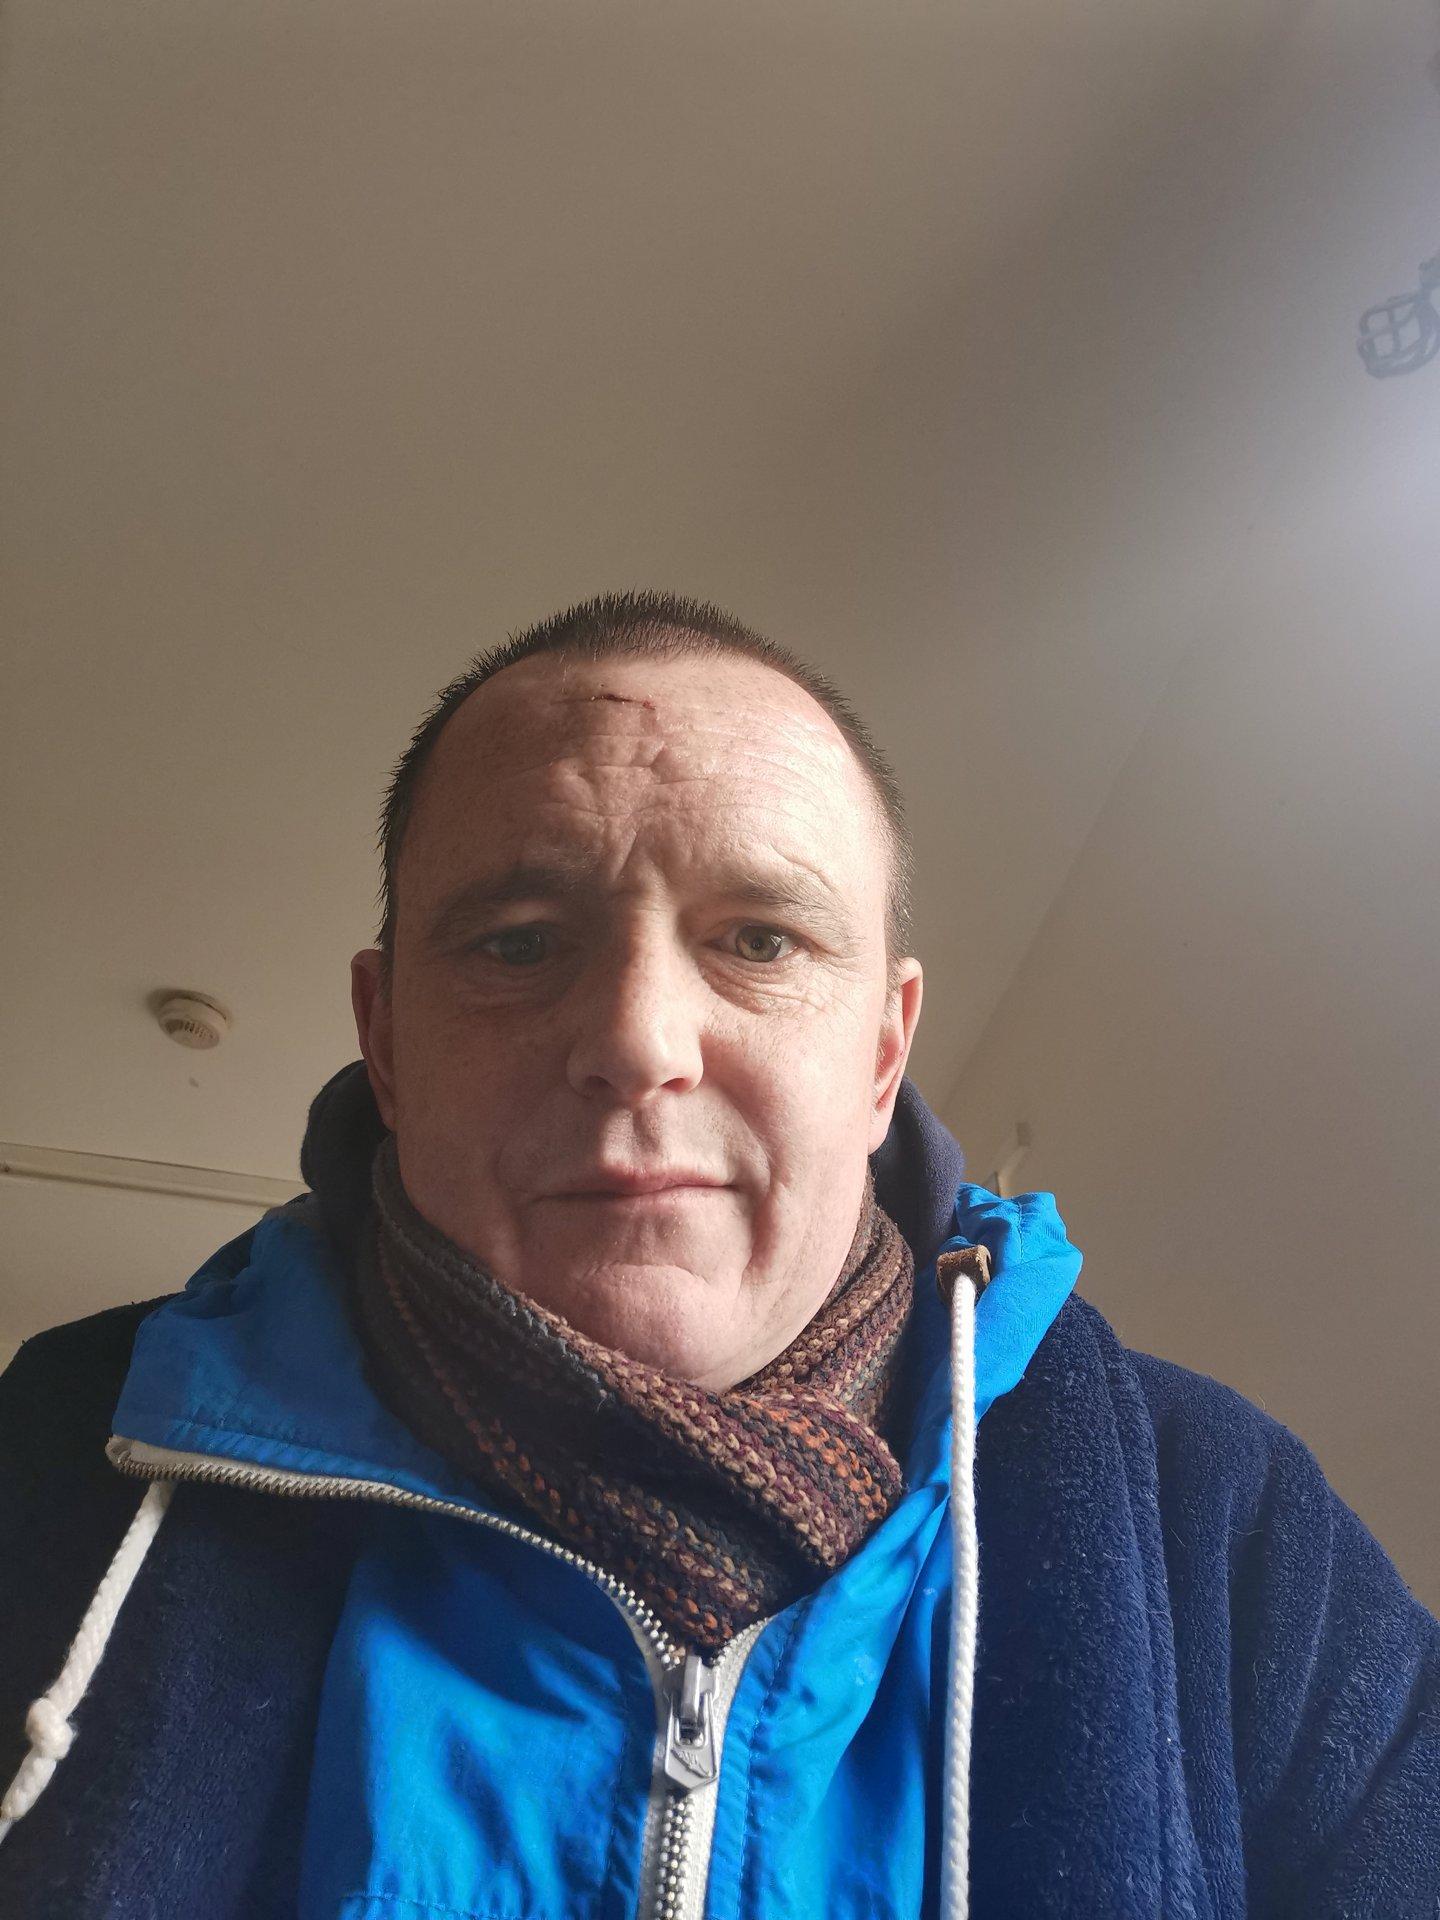 Mark Ballard from Devon,United Kingdom